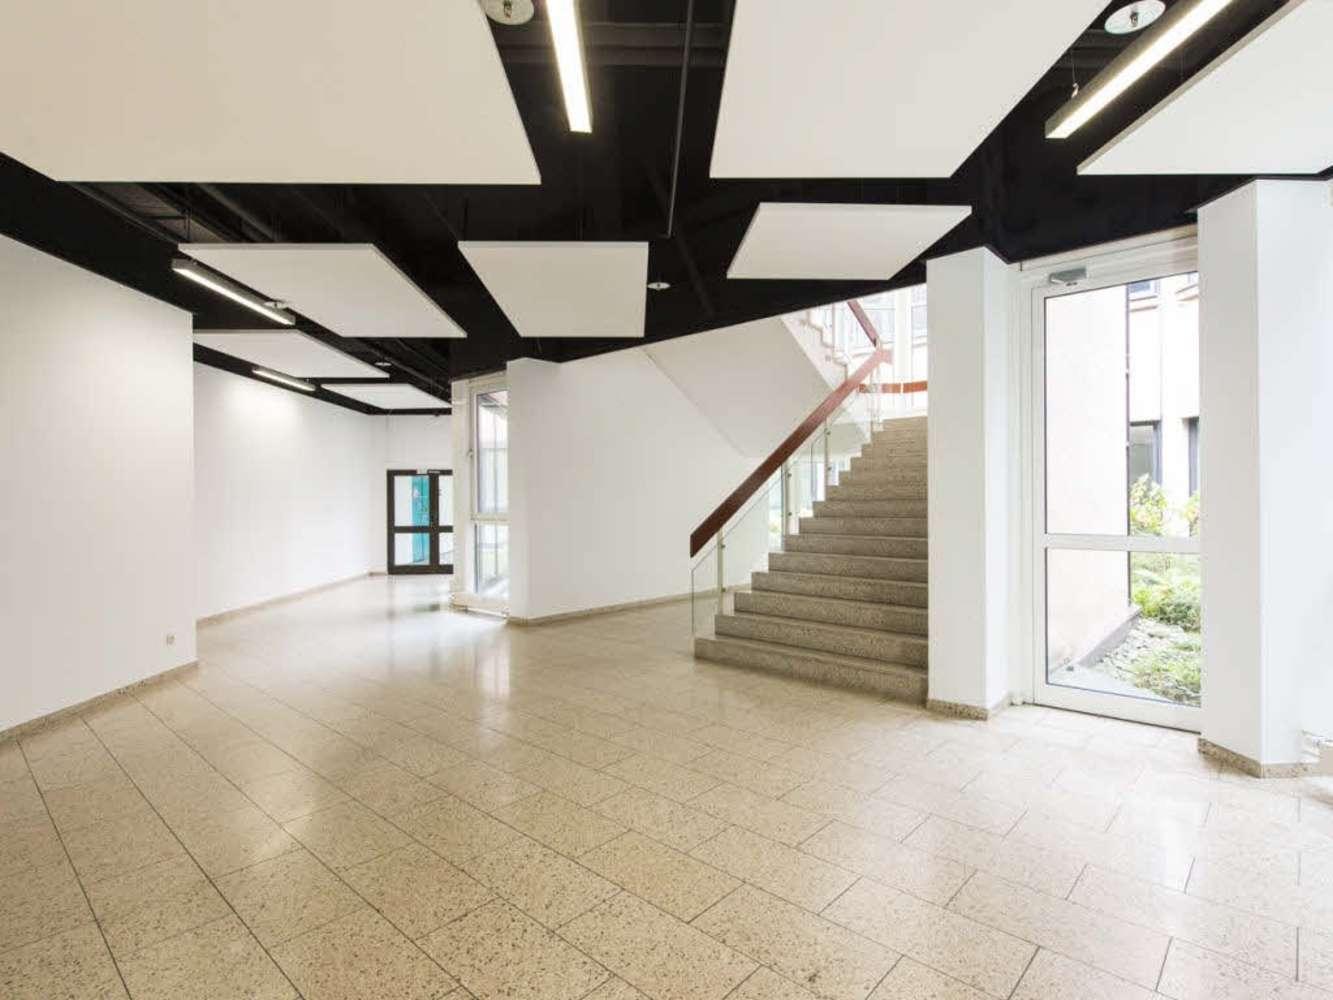 Büros Konstanz, 78467 - Büro - Konstanz, Industriegebiet - F2028 - 9412653